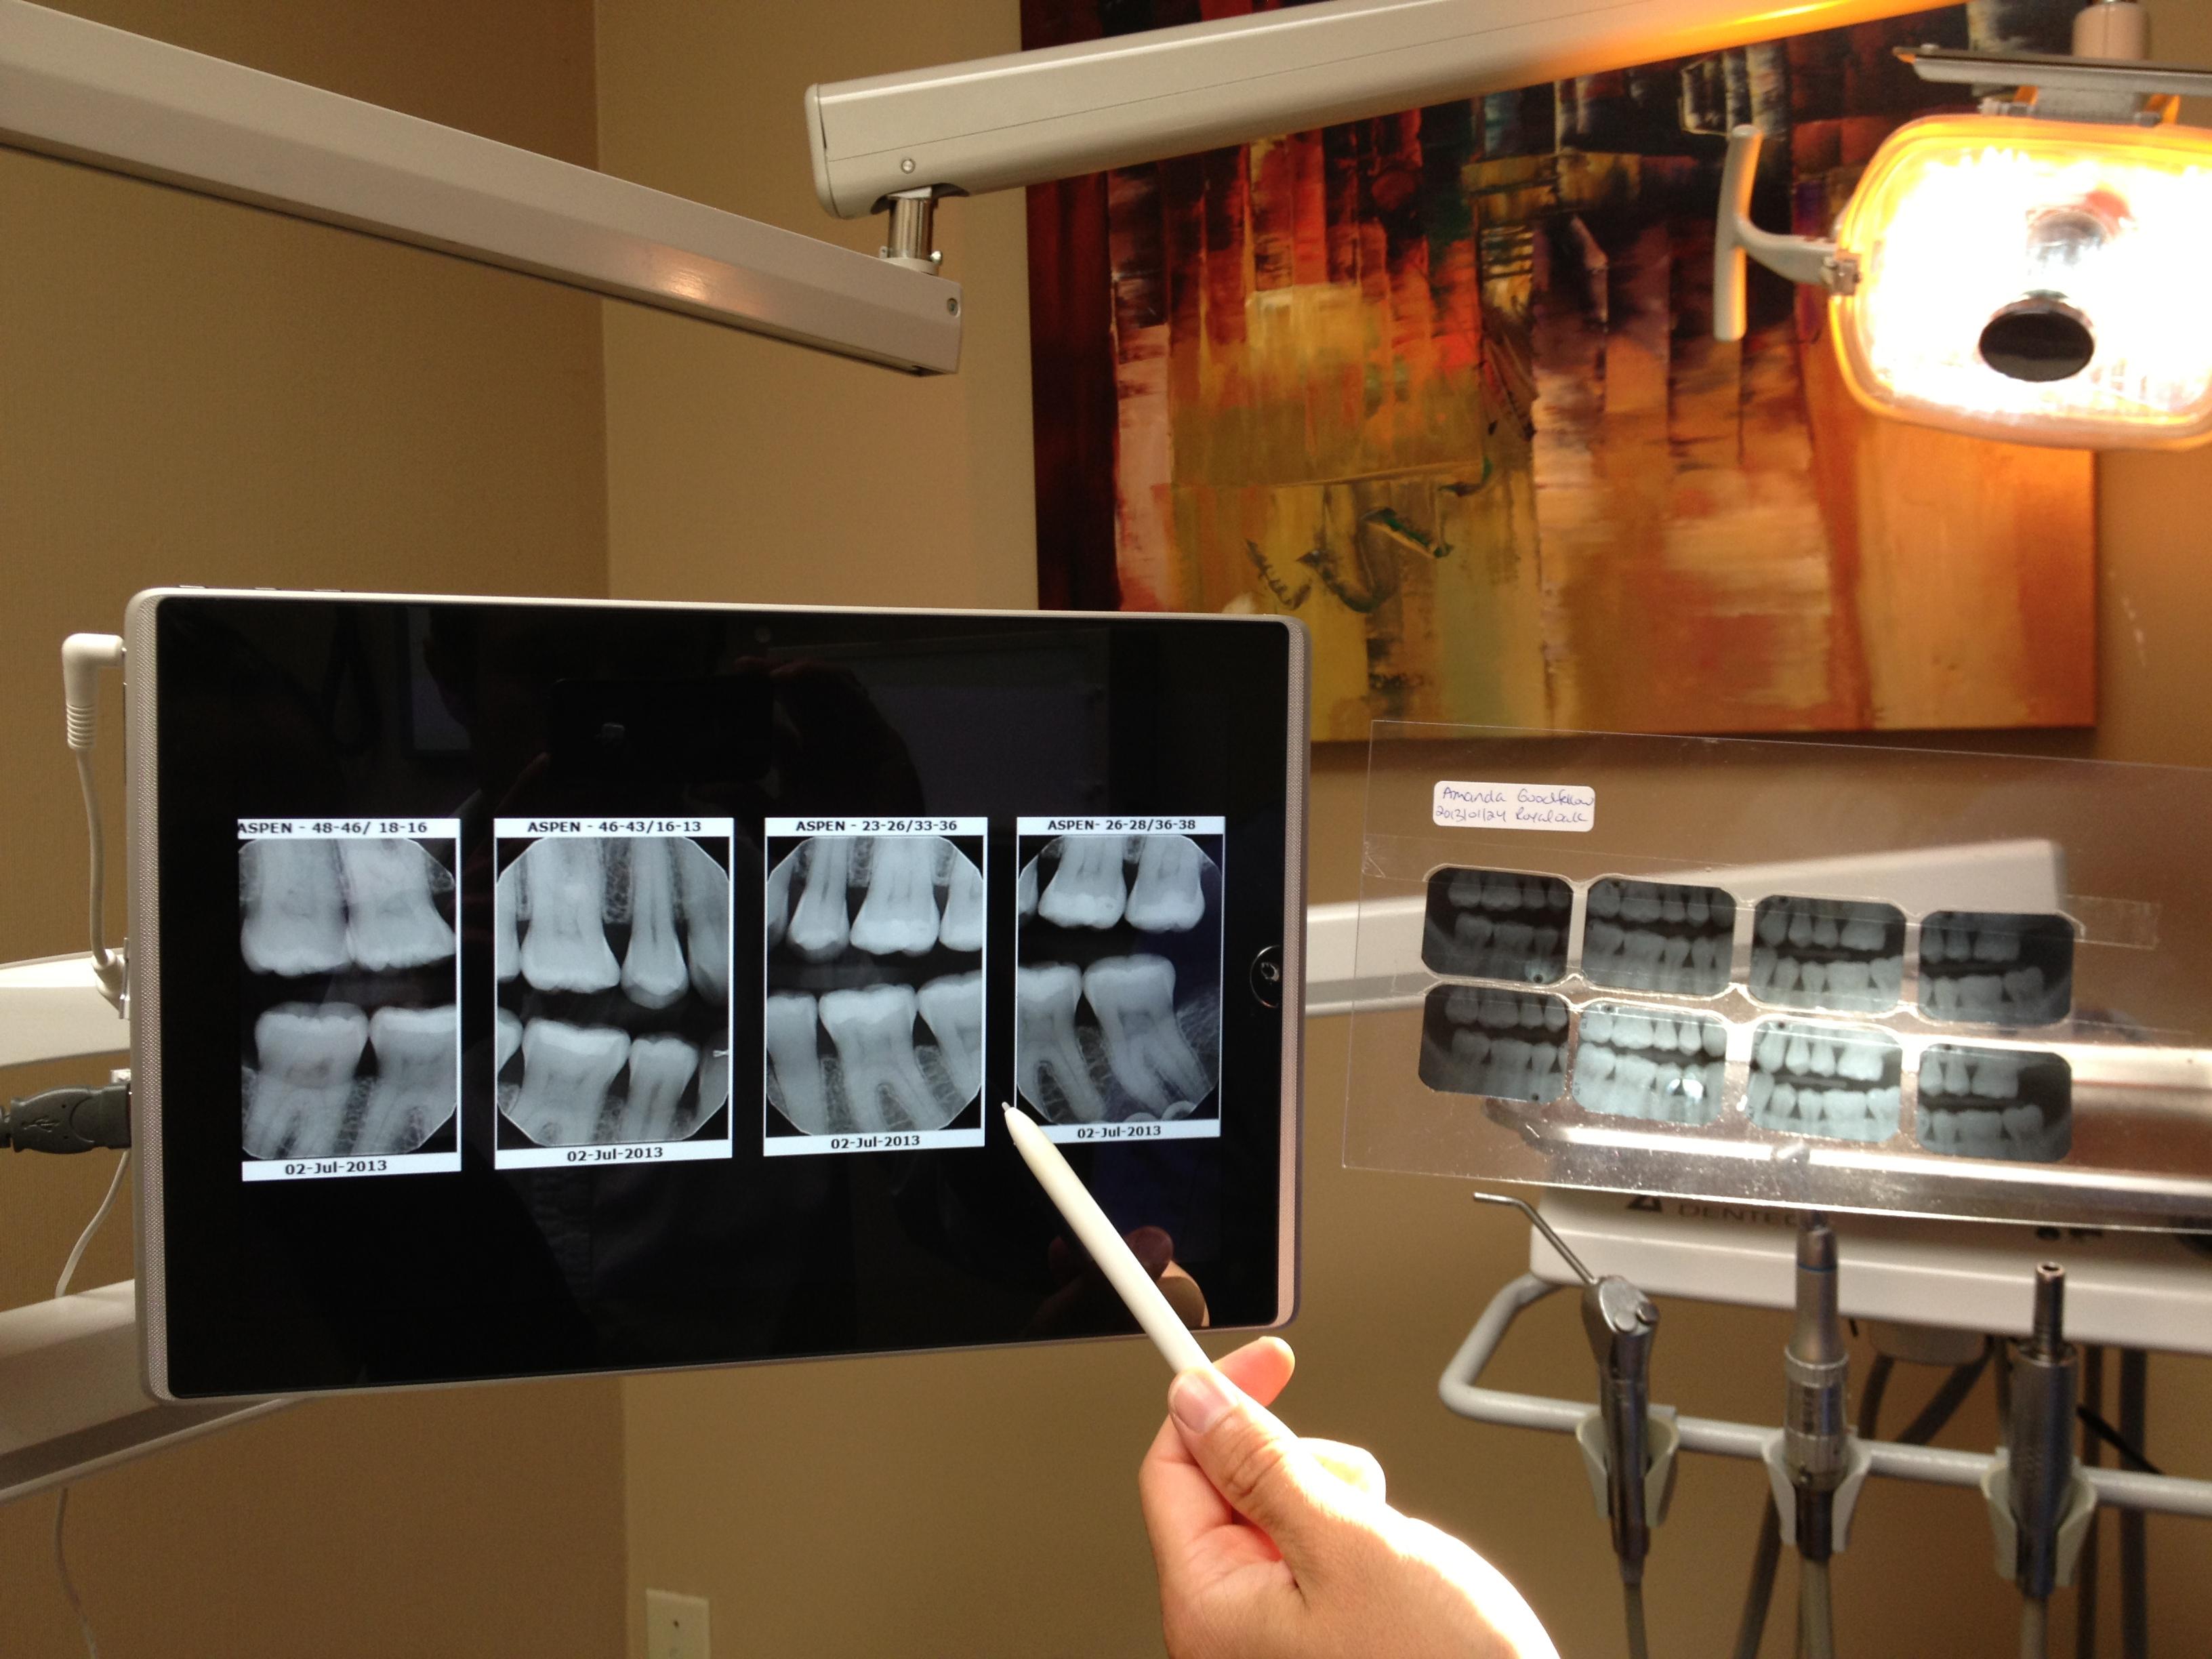 Trust informed dentist treatment services parkway dental old analog x ray comparison vs digital x rays solutioingenieria Choice Image